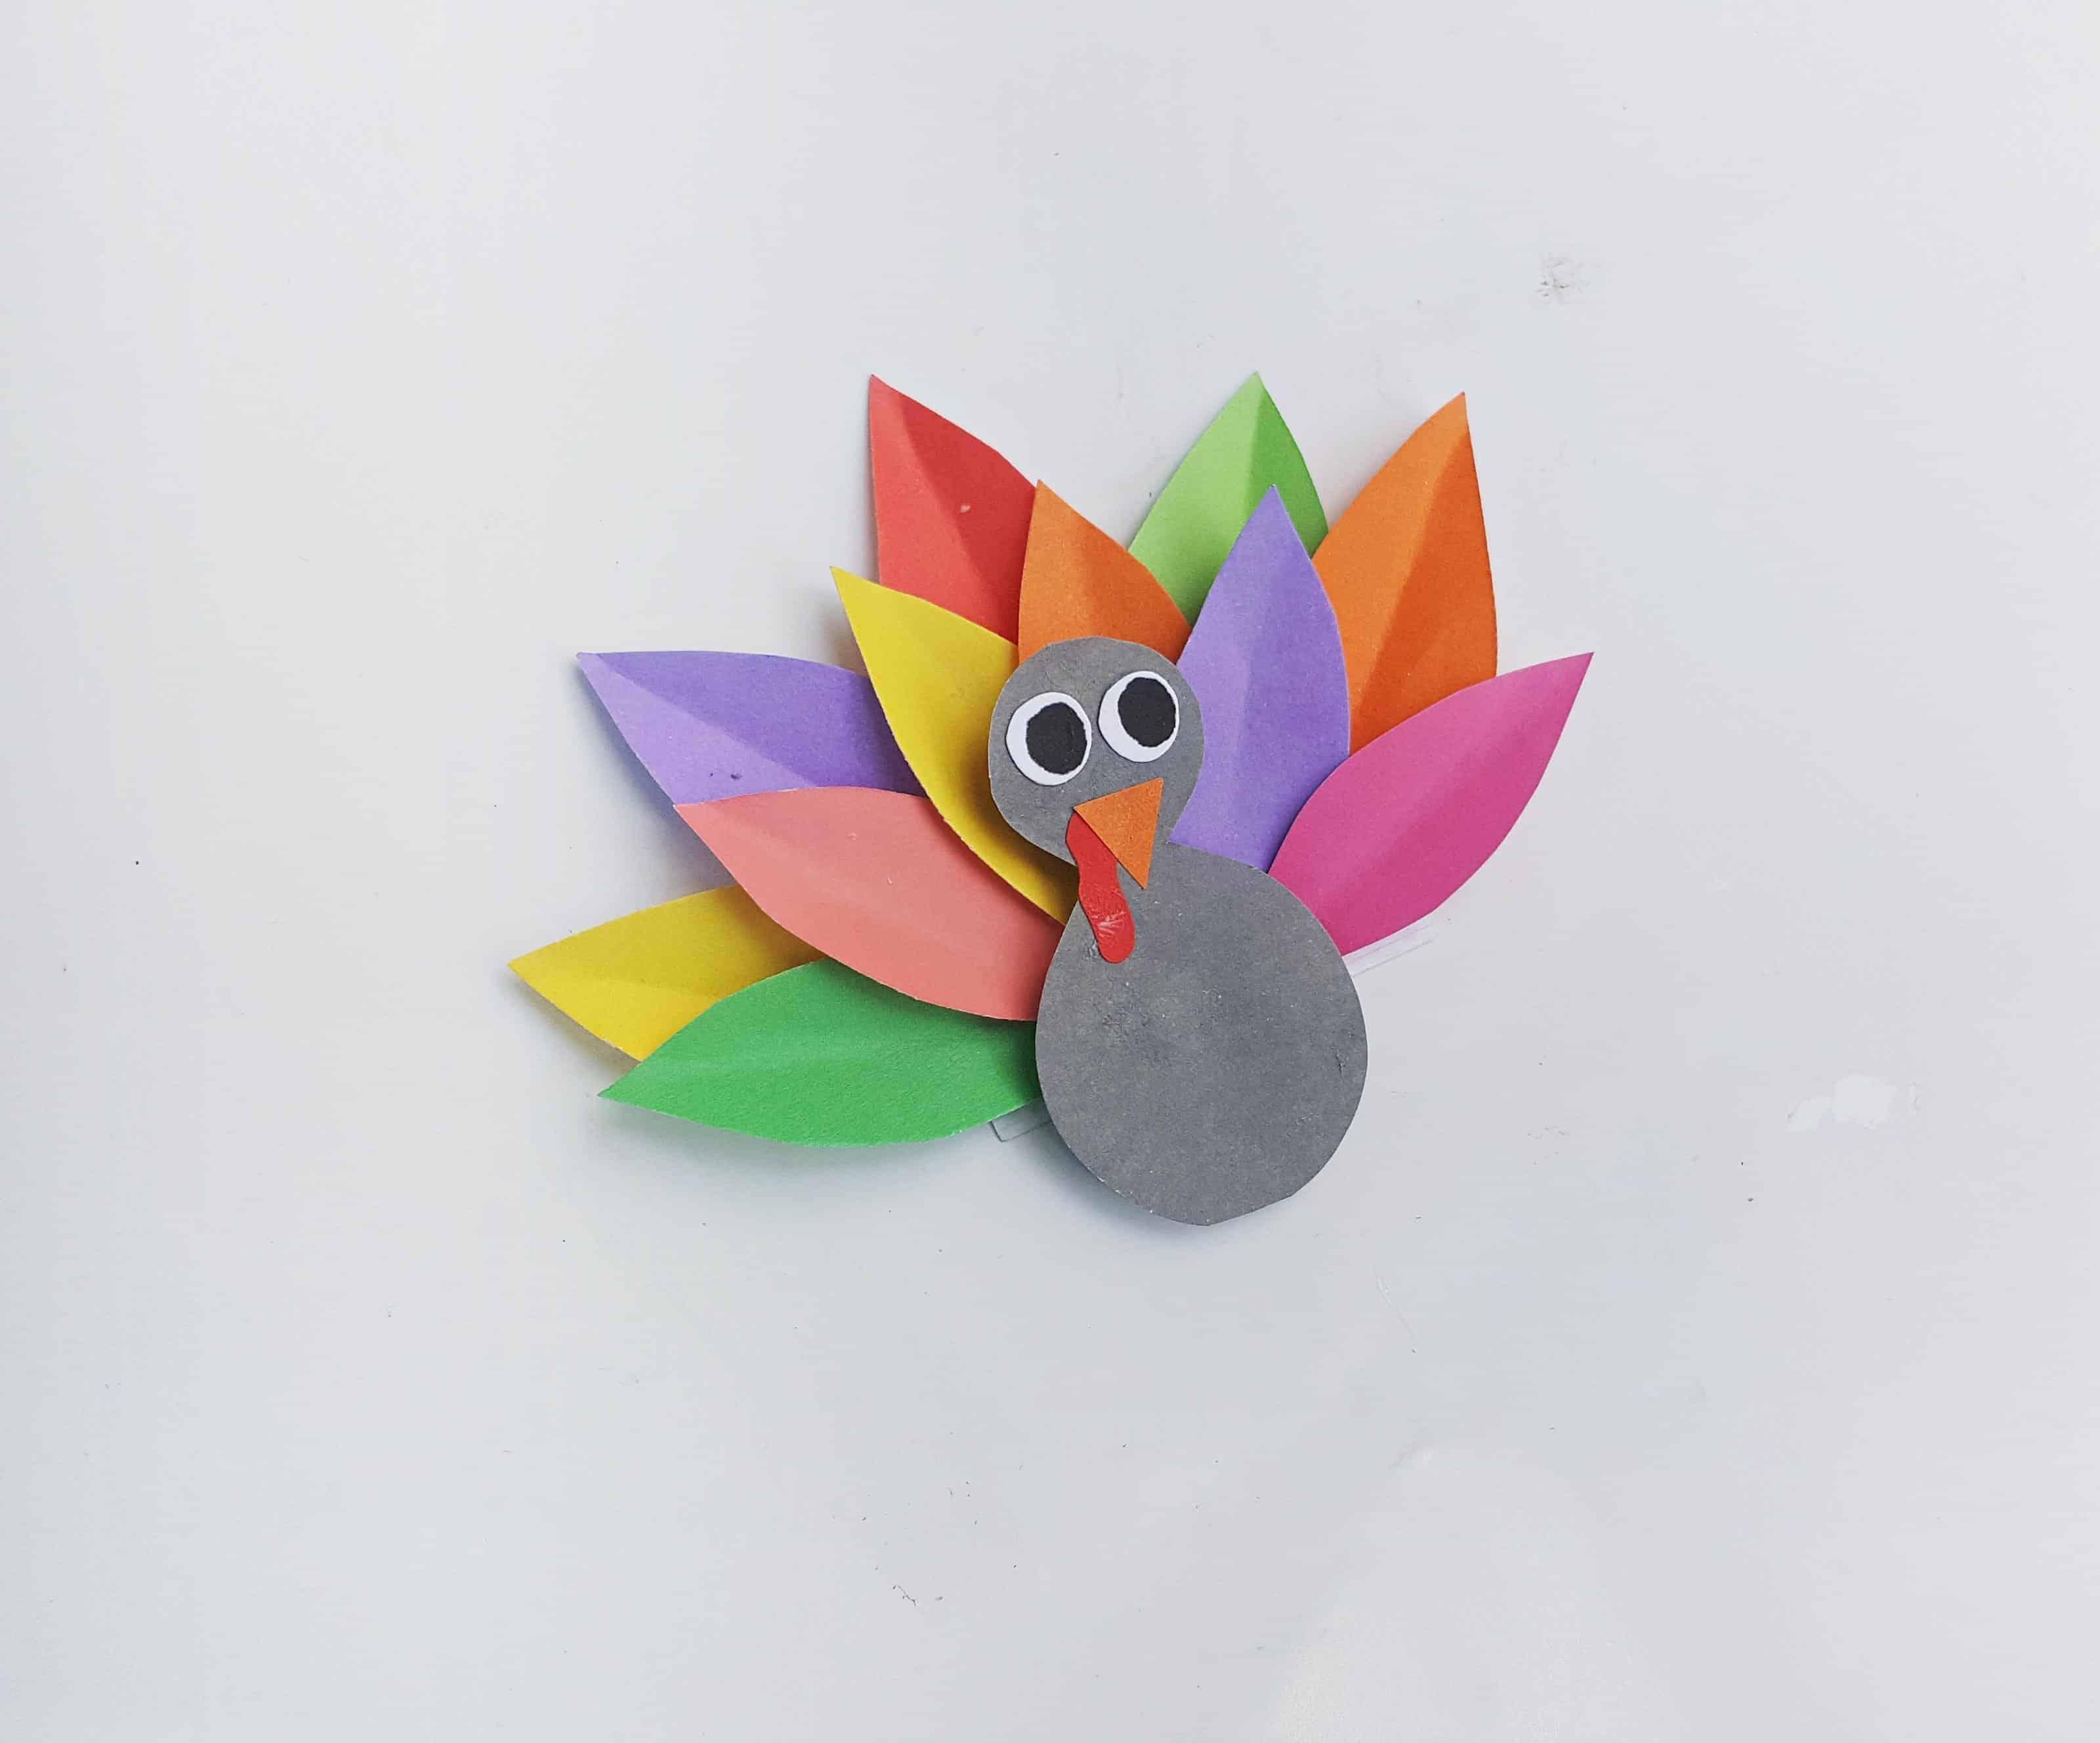 rainbow thanksgiving turkey craft